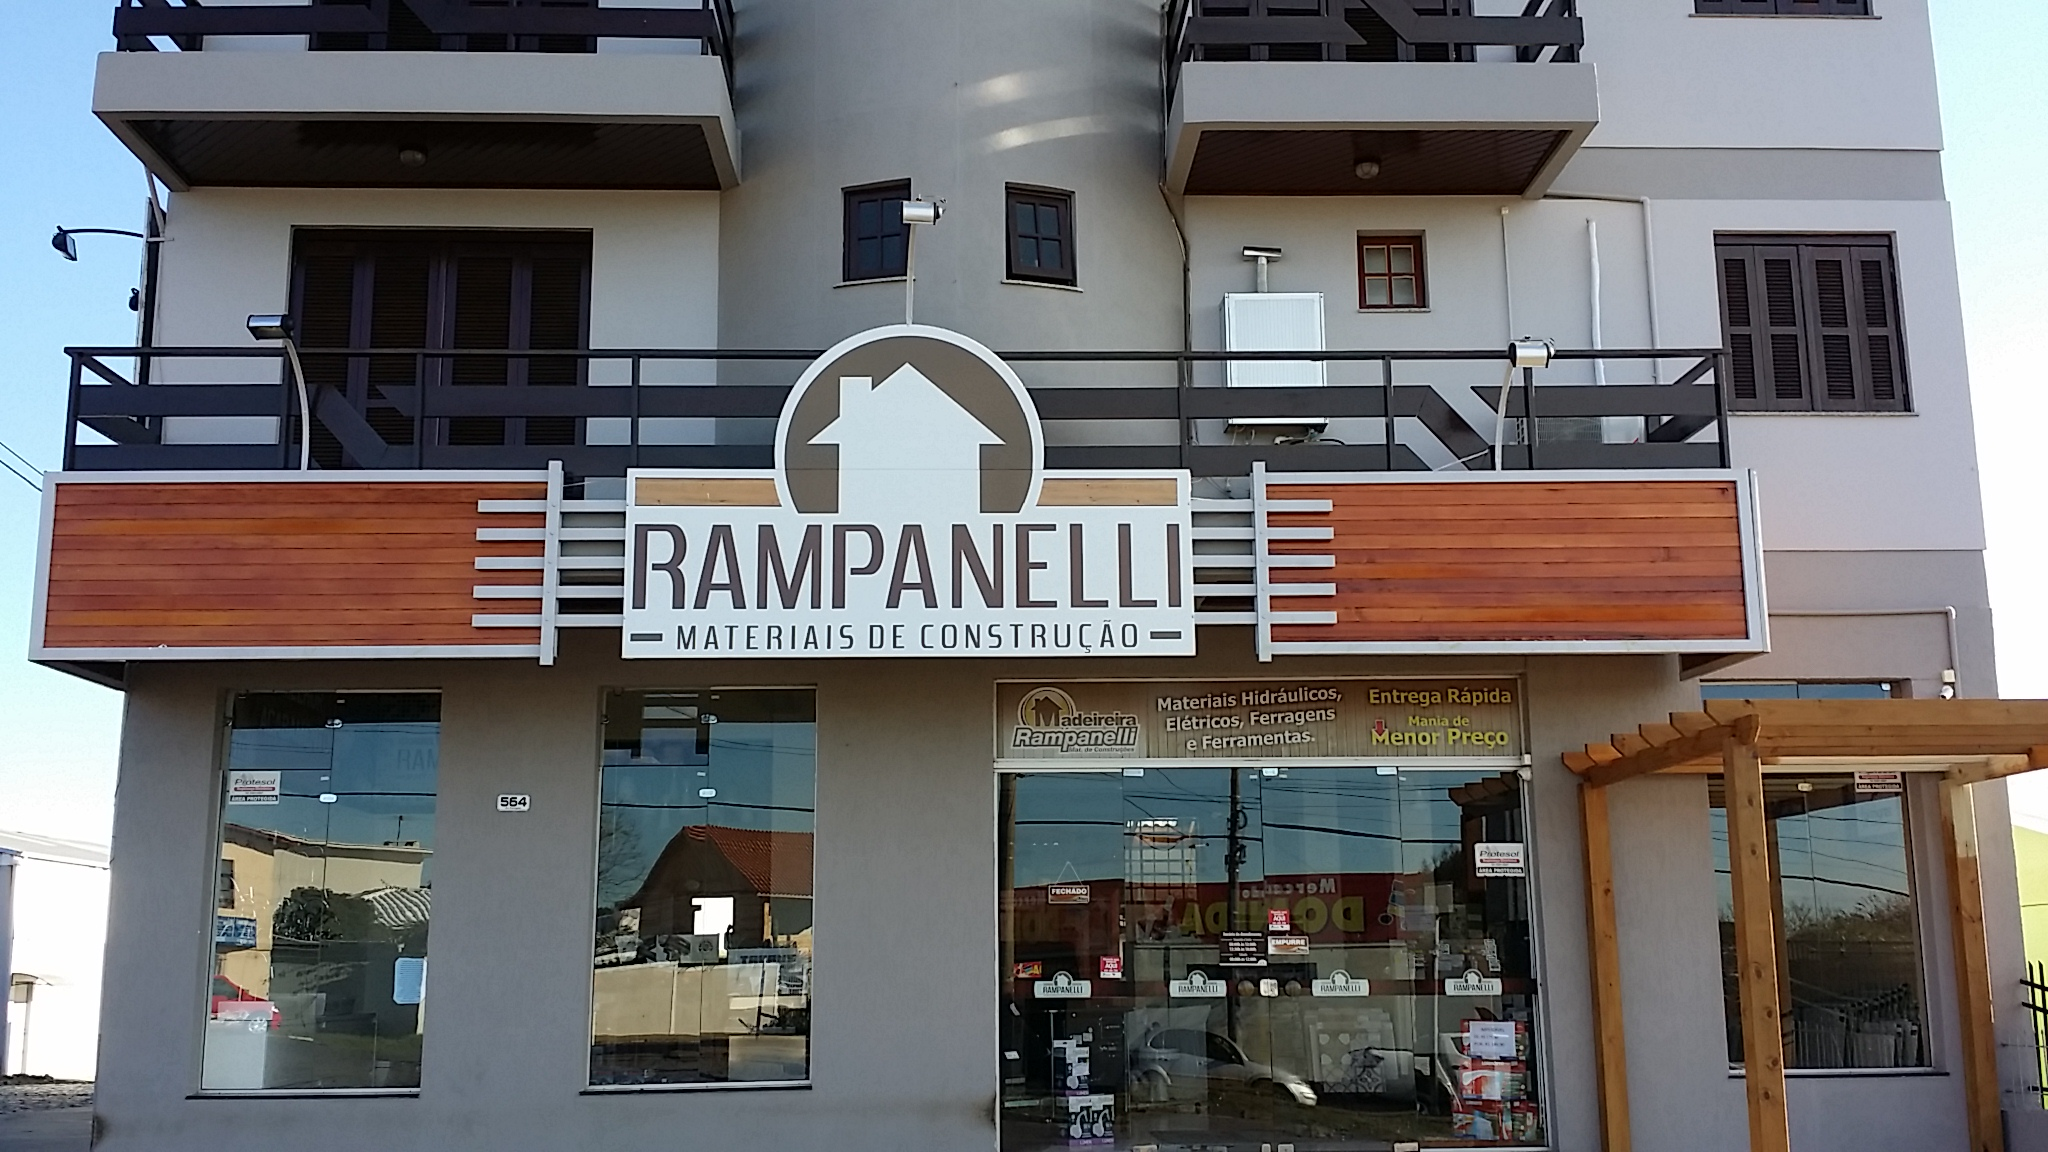 Rampanelli 2